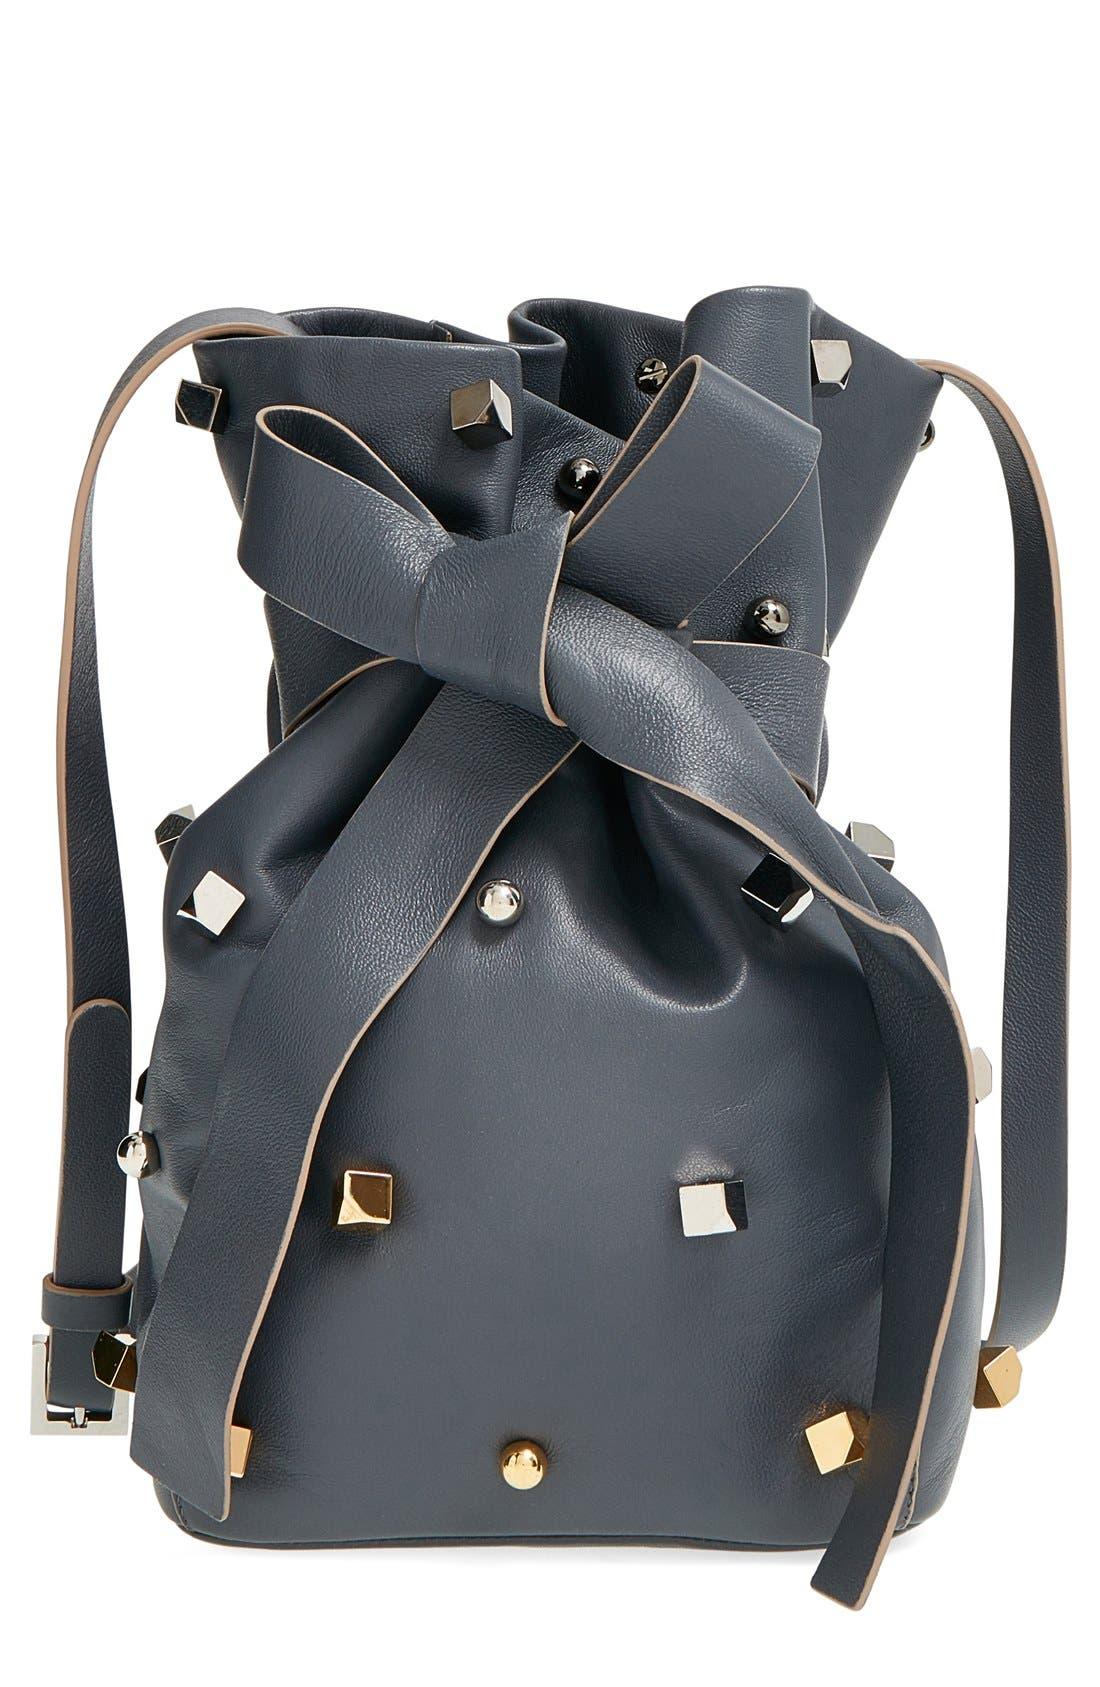 Main Image - Jimmy Choo 'Eve' Studded Bucket Bag